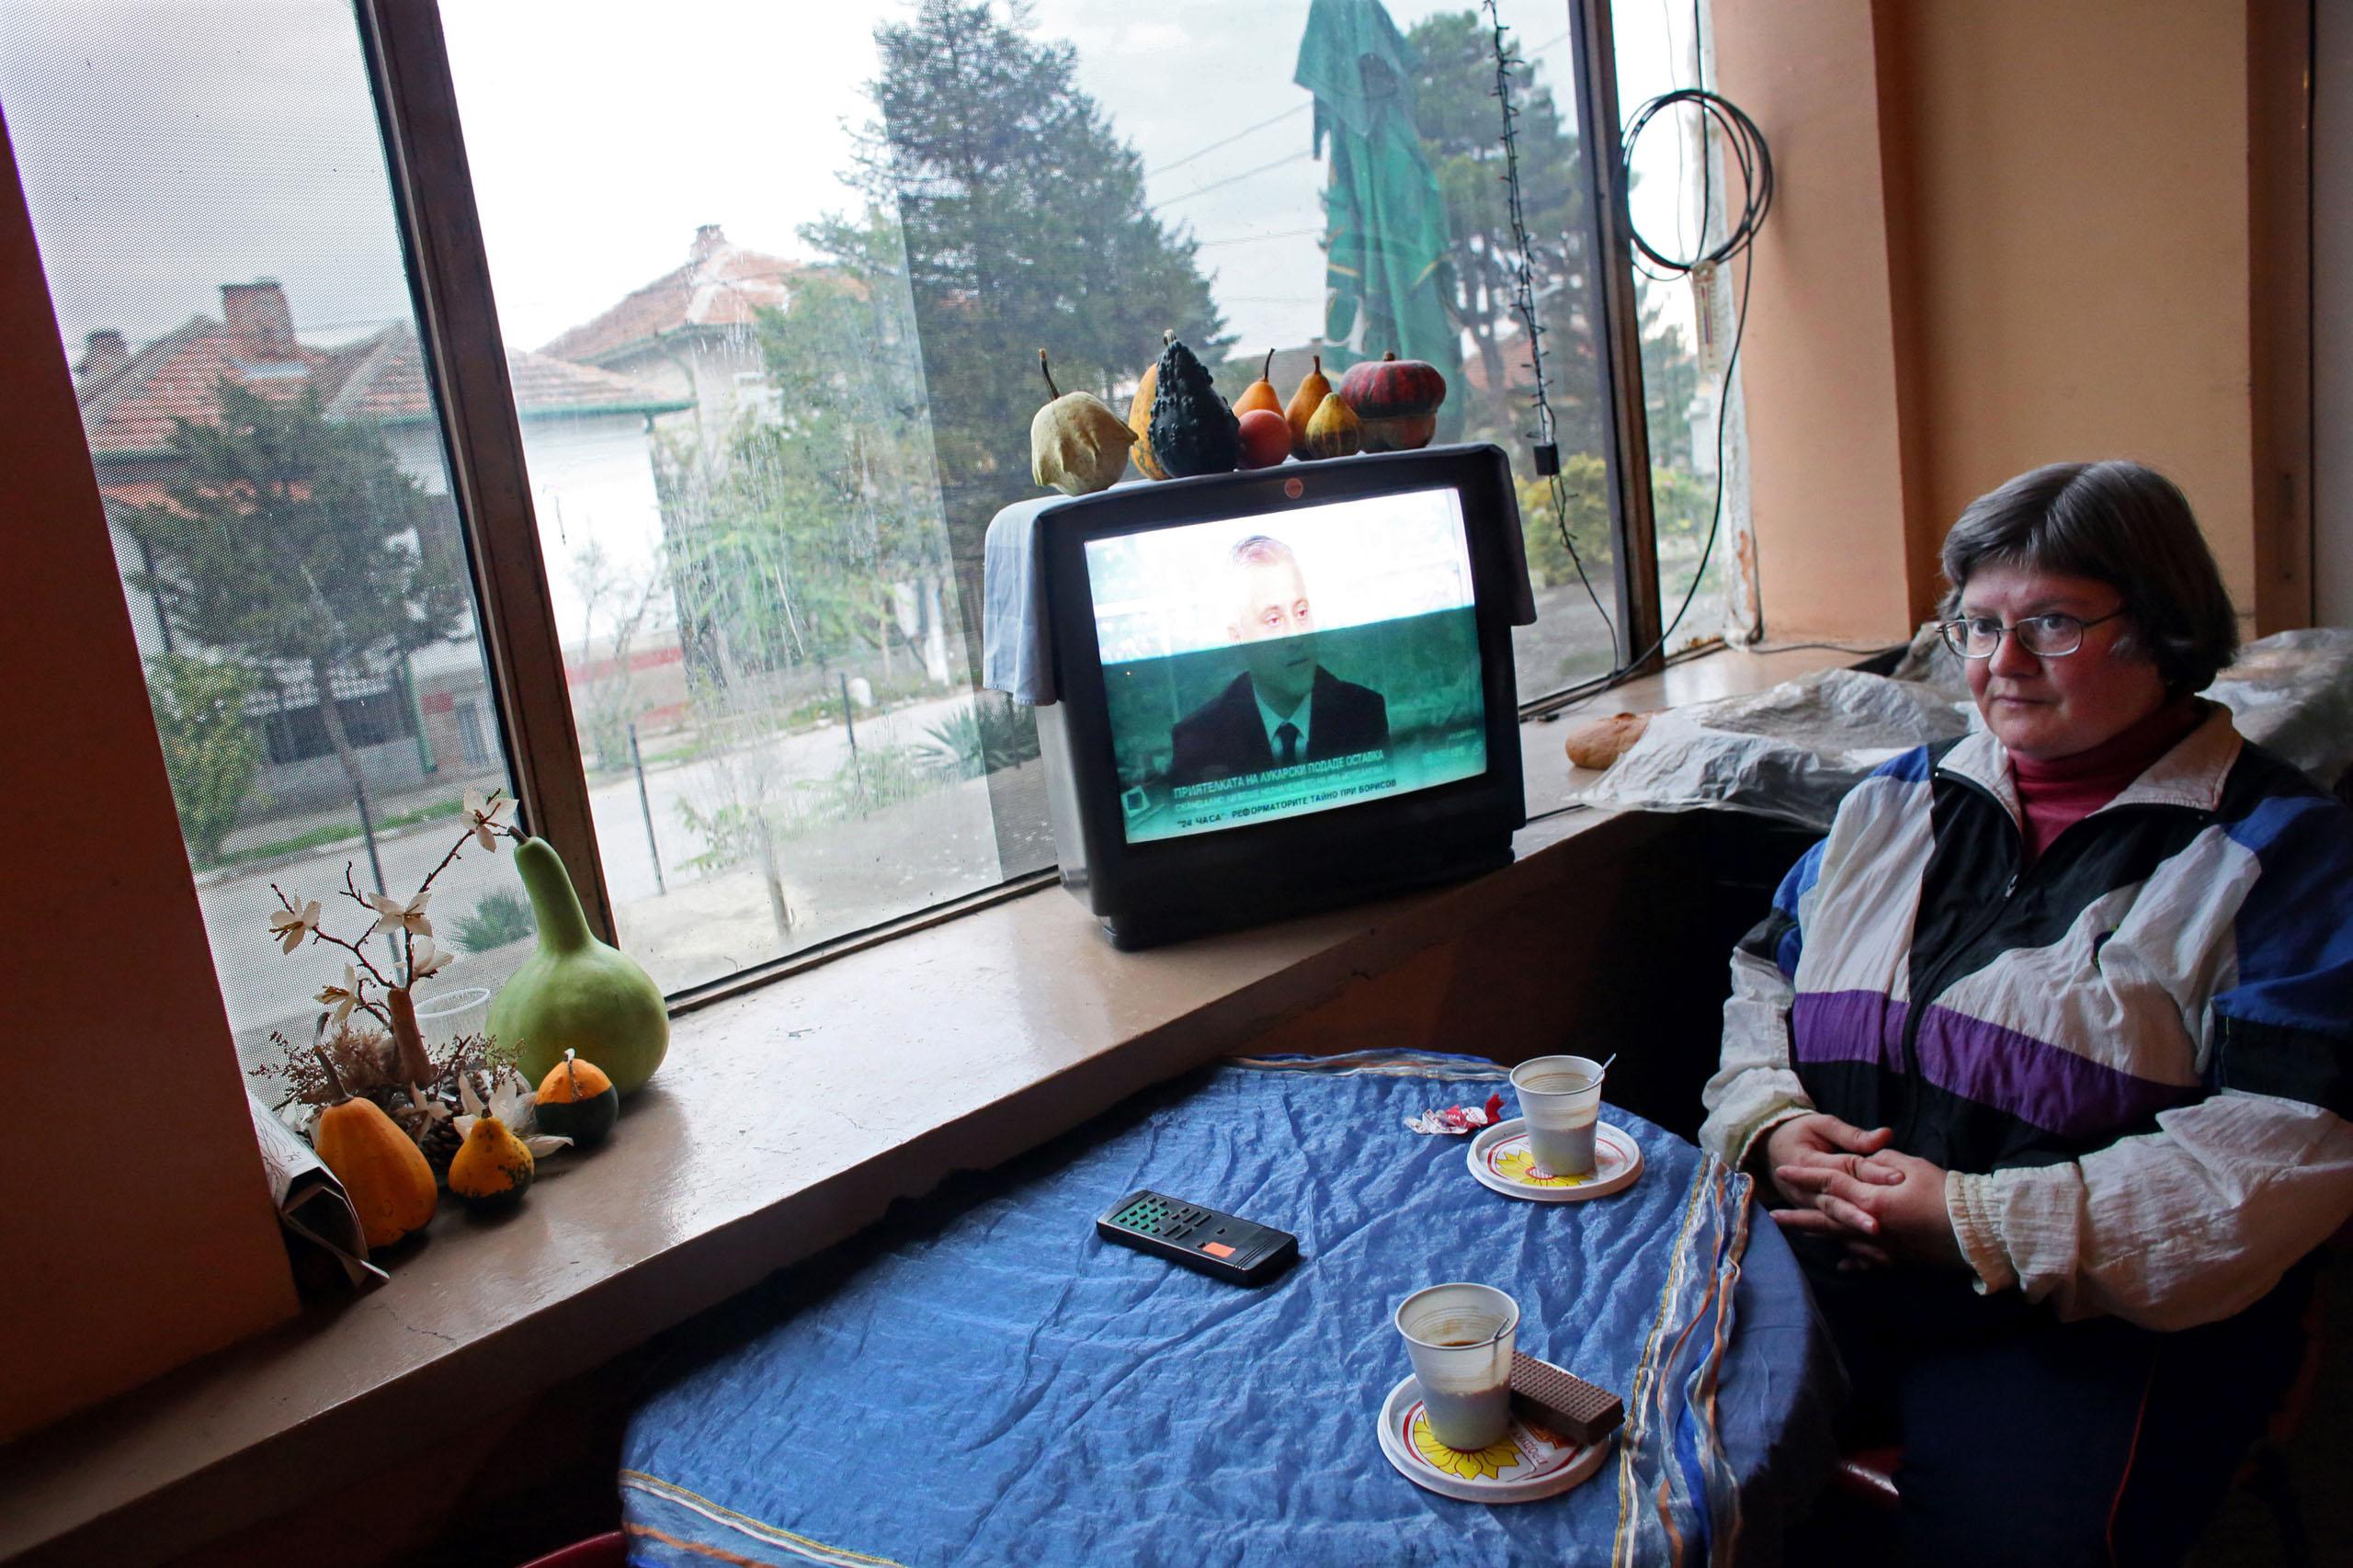 Veselka Vasileva sits at a grocery store in Sinagovtsi, Bulgaria, Oct. 22, 2014.